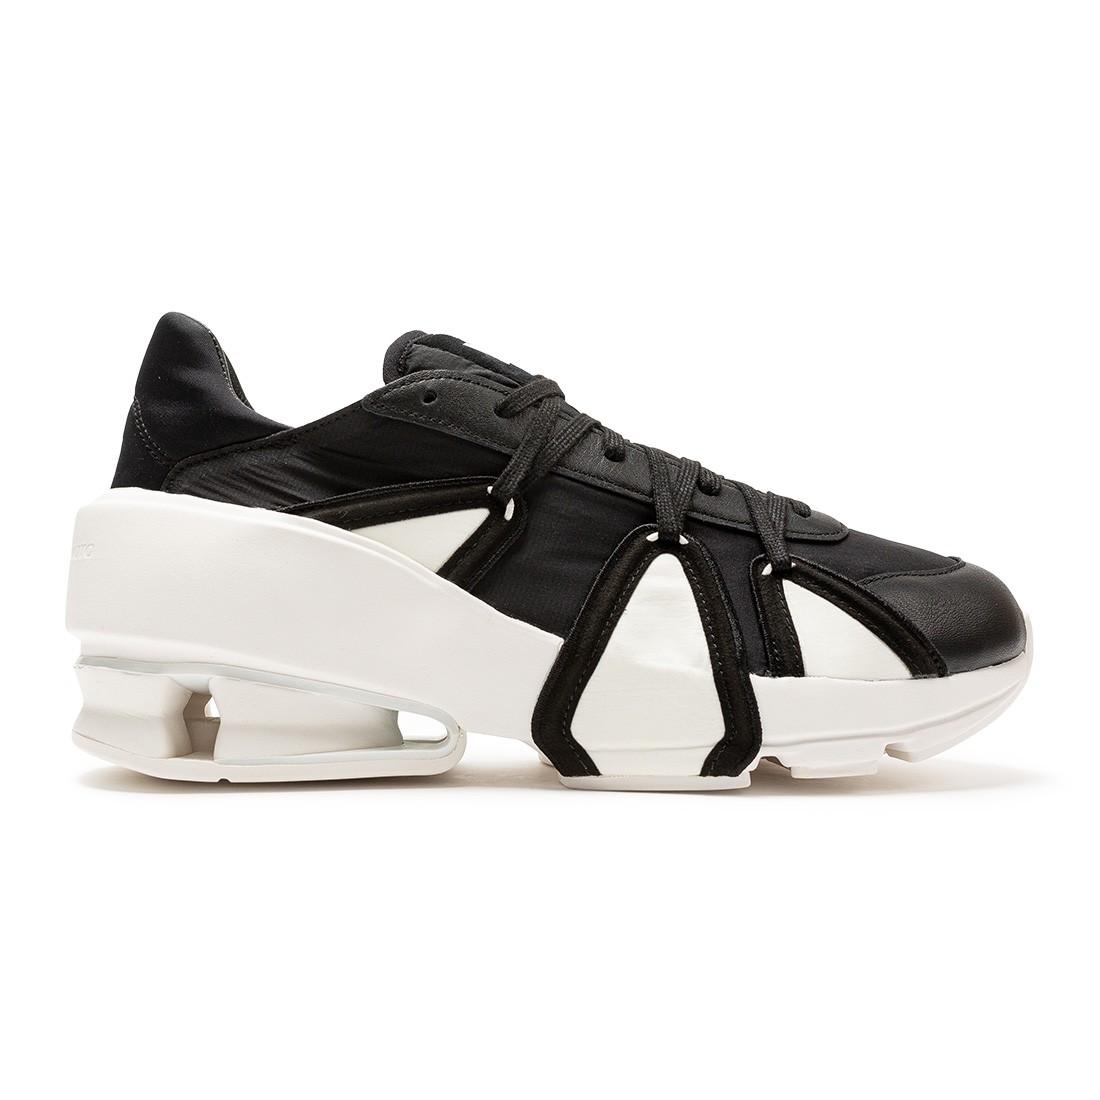 Adidas Y-3 Men Sukui III (black / core whit)